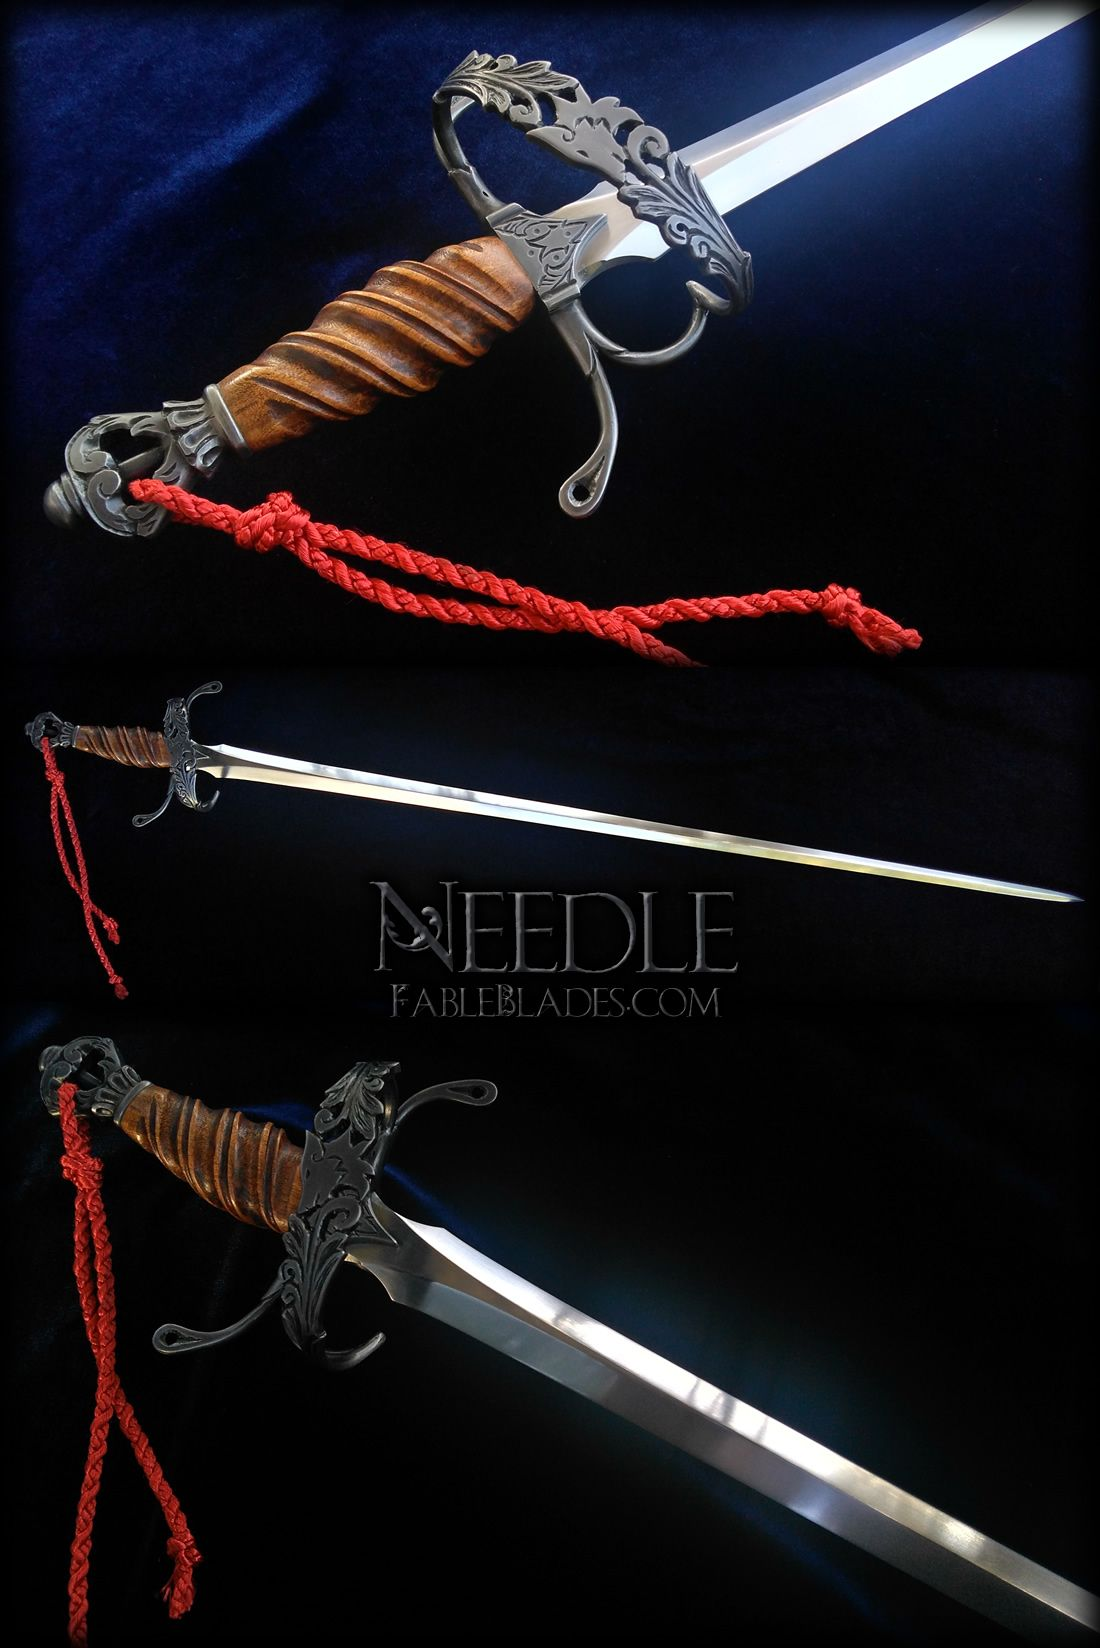 This is my take on how I believe Arya Stark's sword Needle